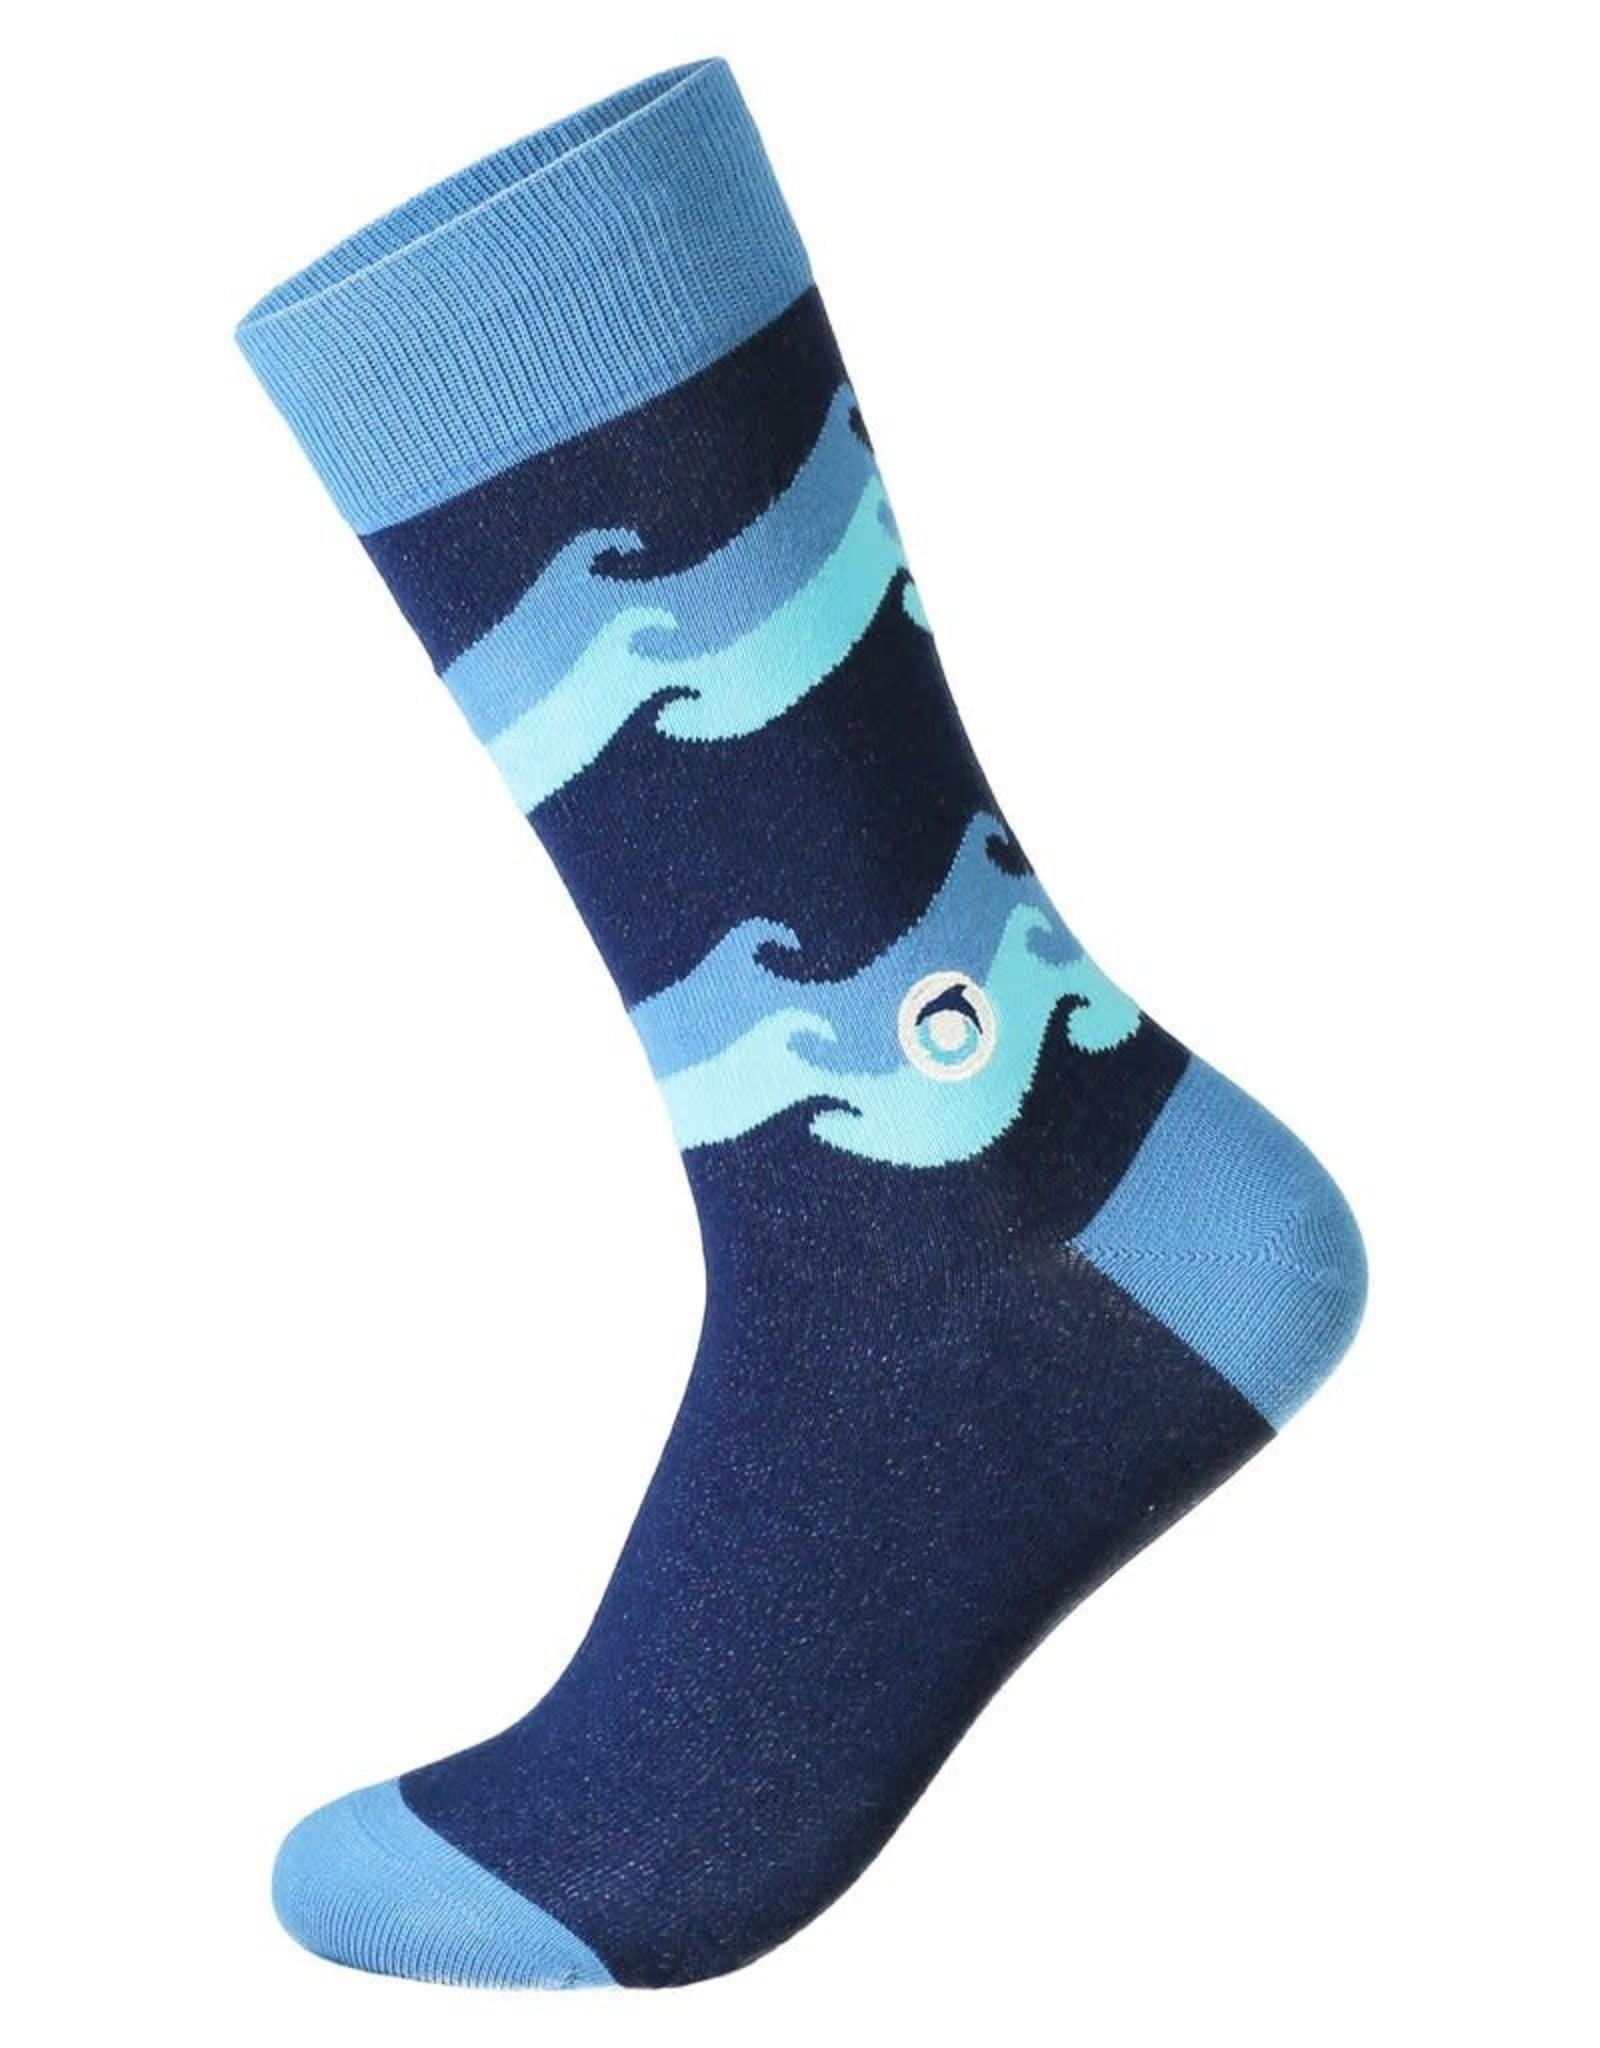 Socks That Protect Oceans